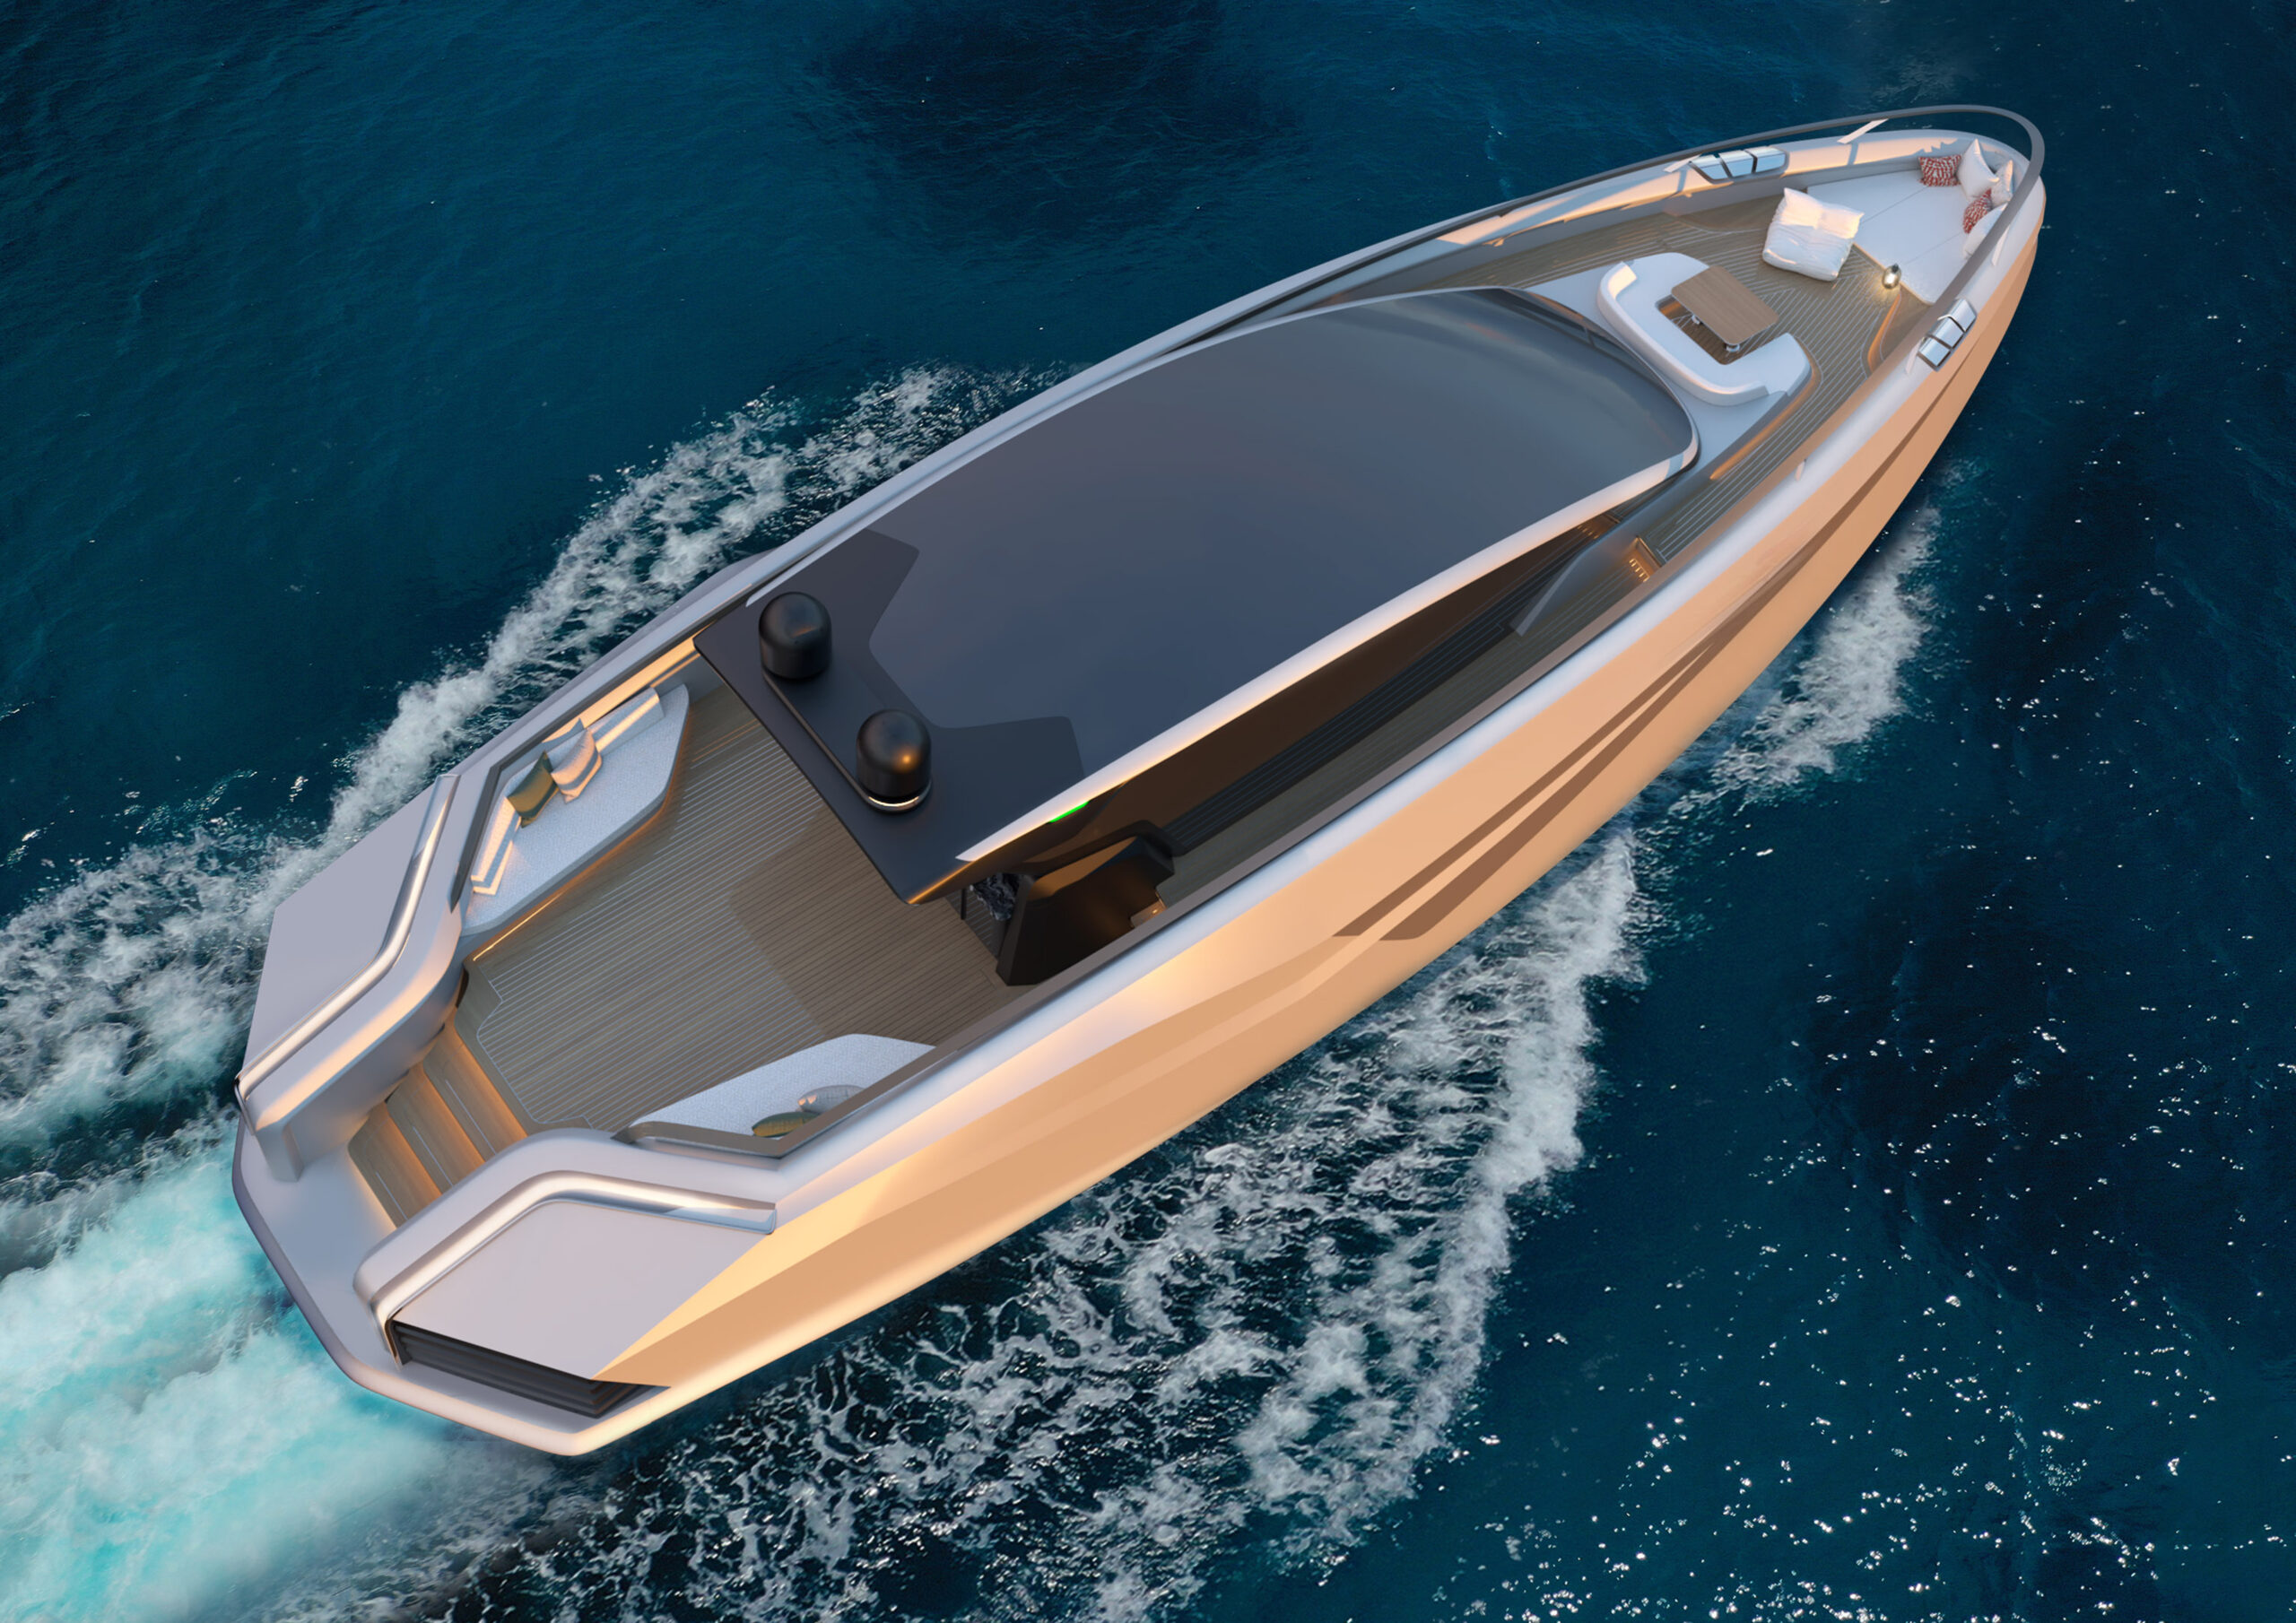 Azurite Yacht Design Infint-e 88 cruising from above